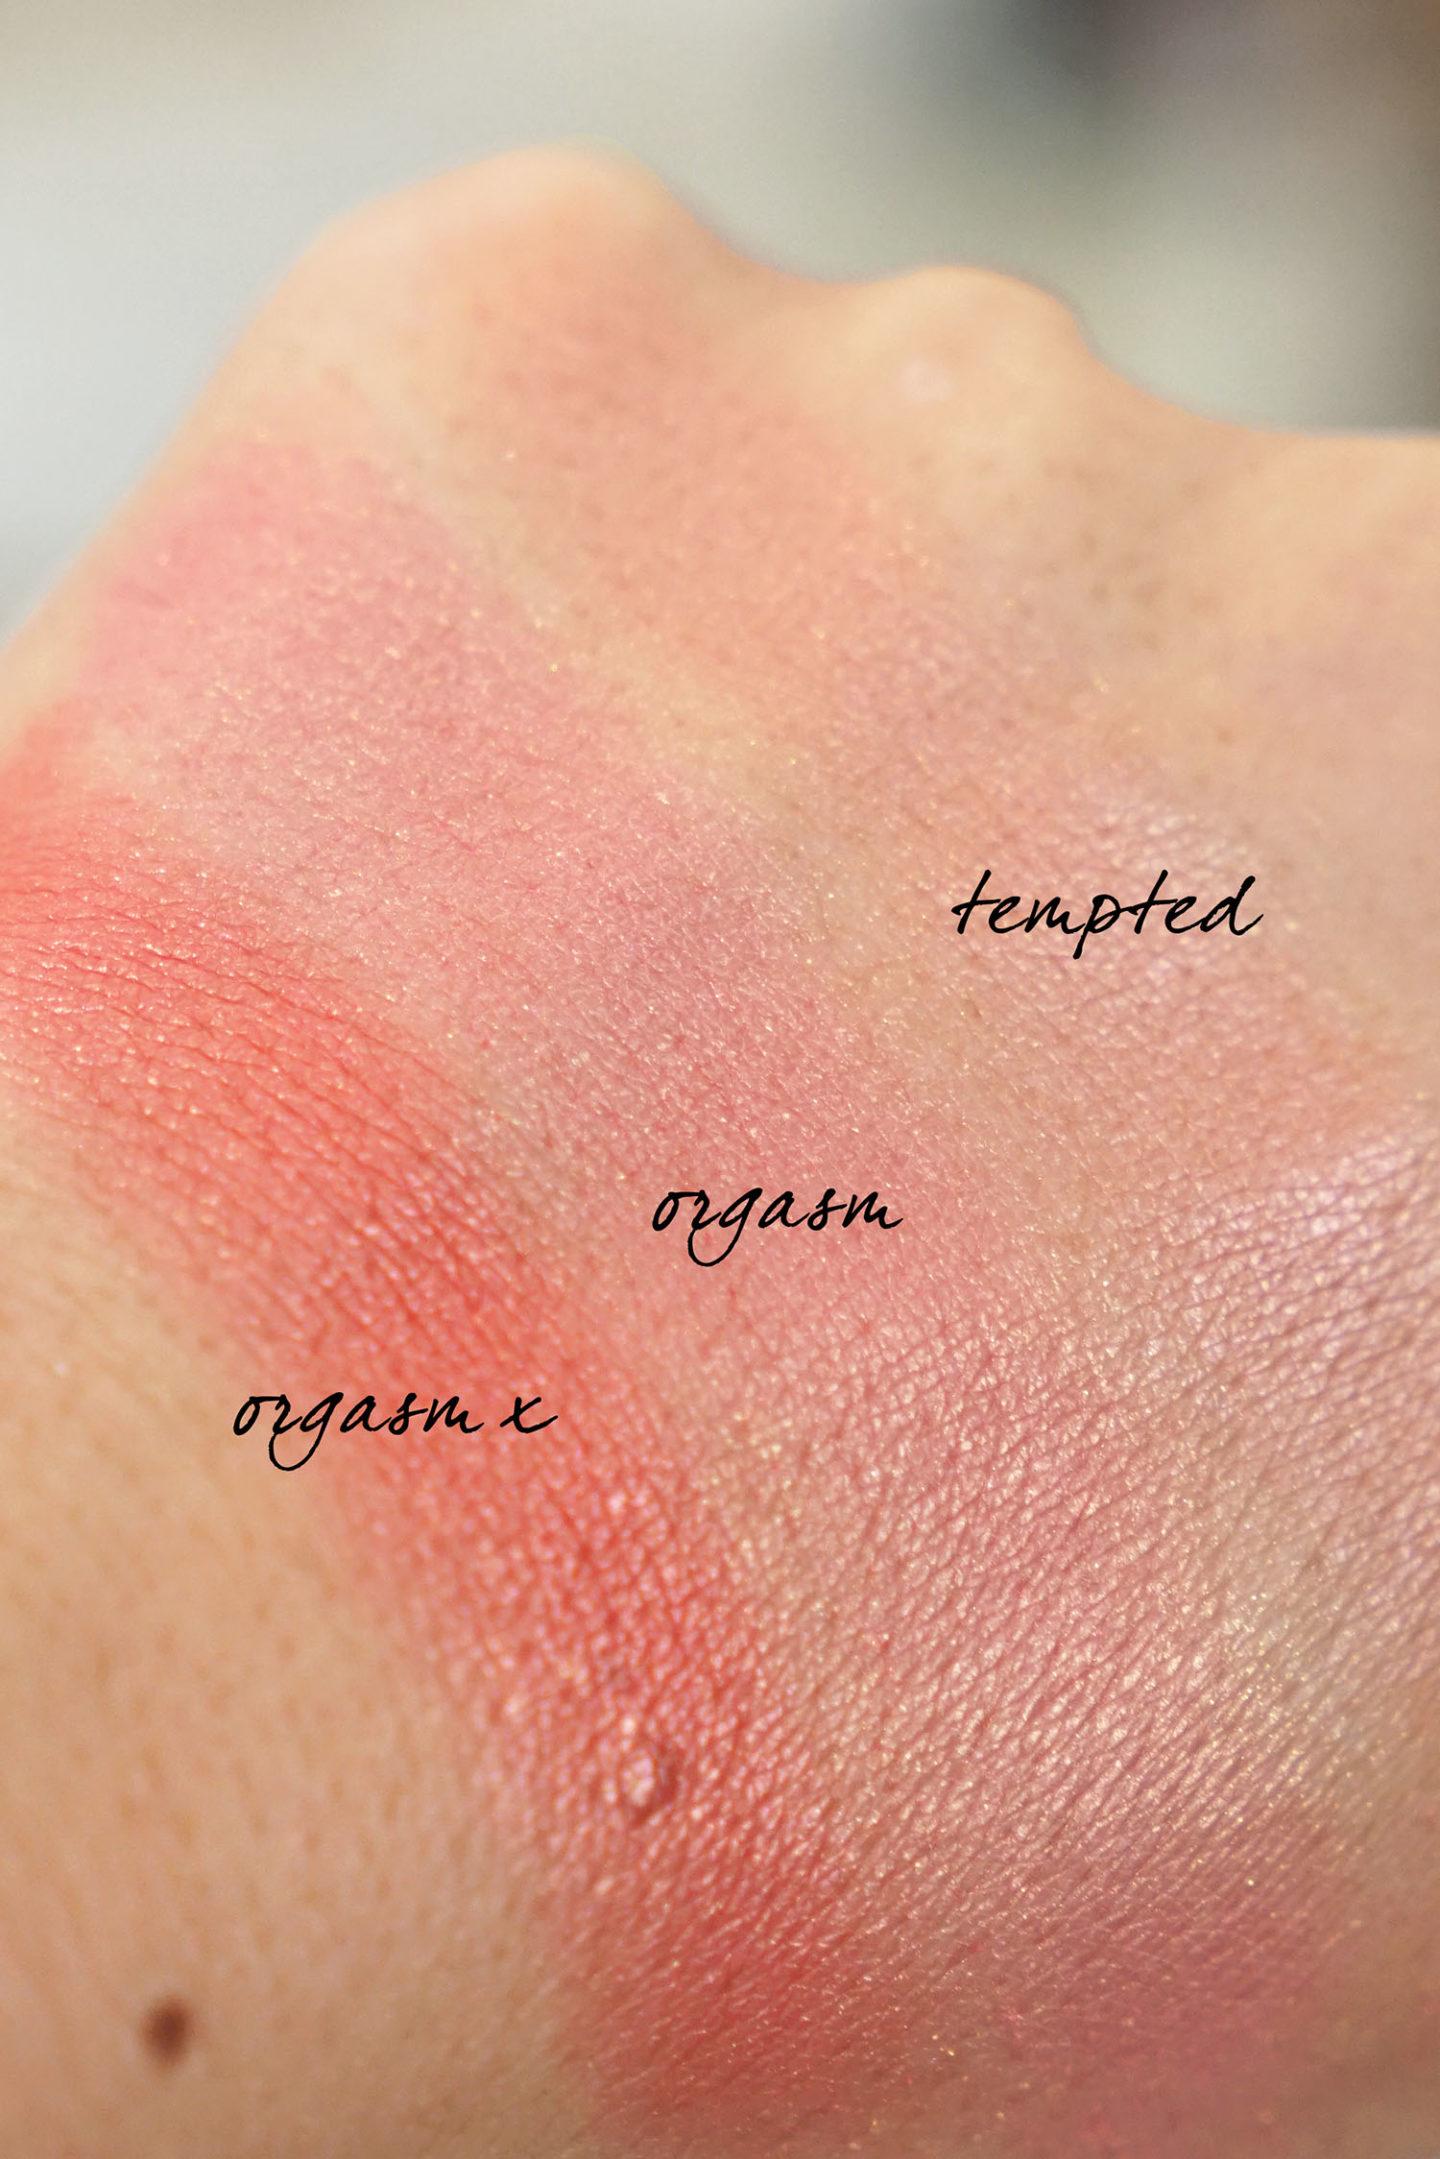 Échantillons NARS Orgasm X, Orgasm and Tempted Blush